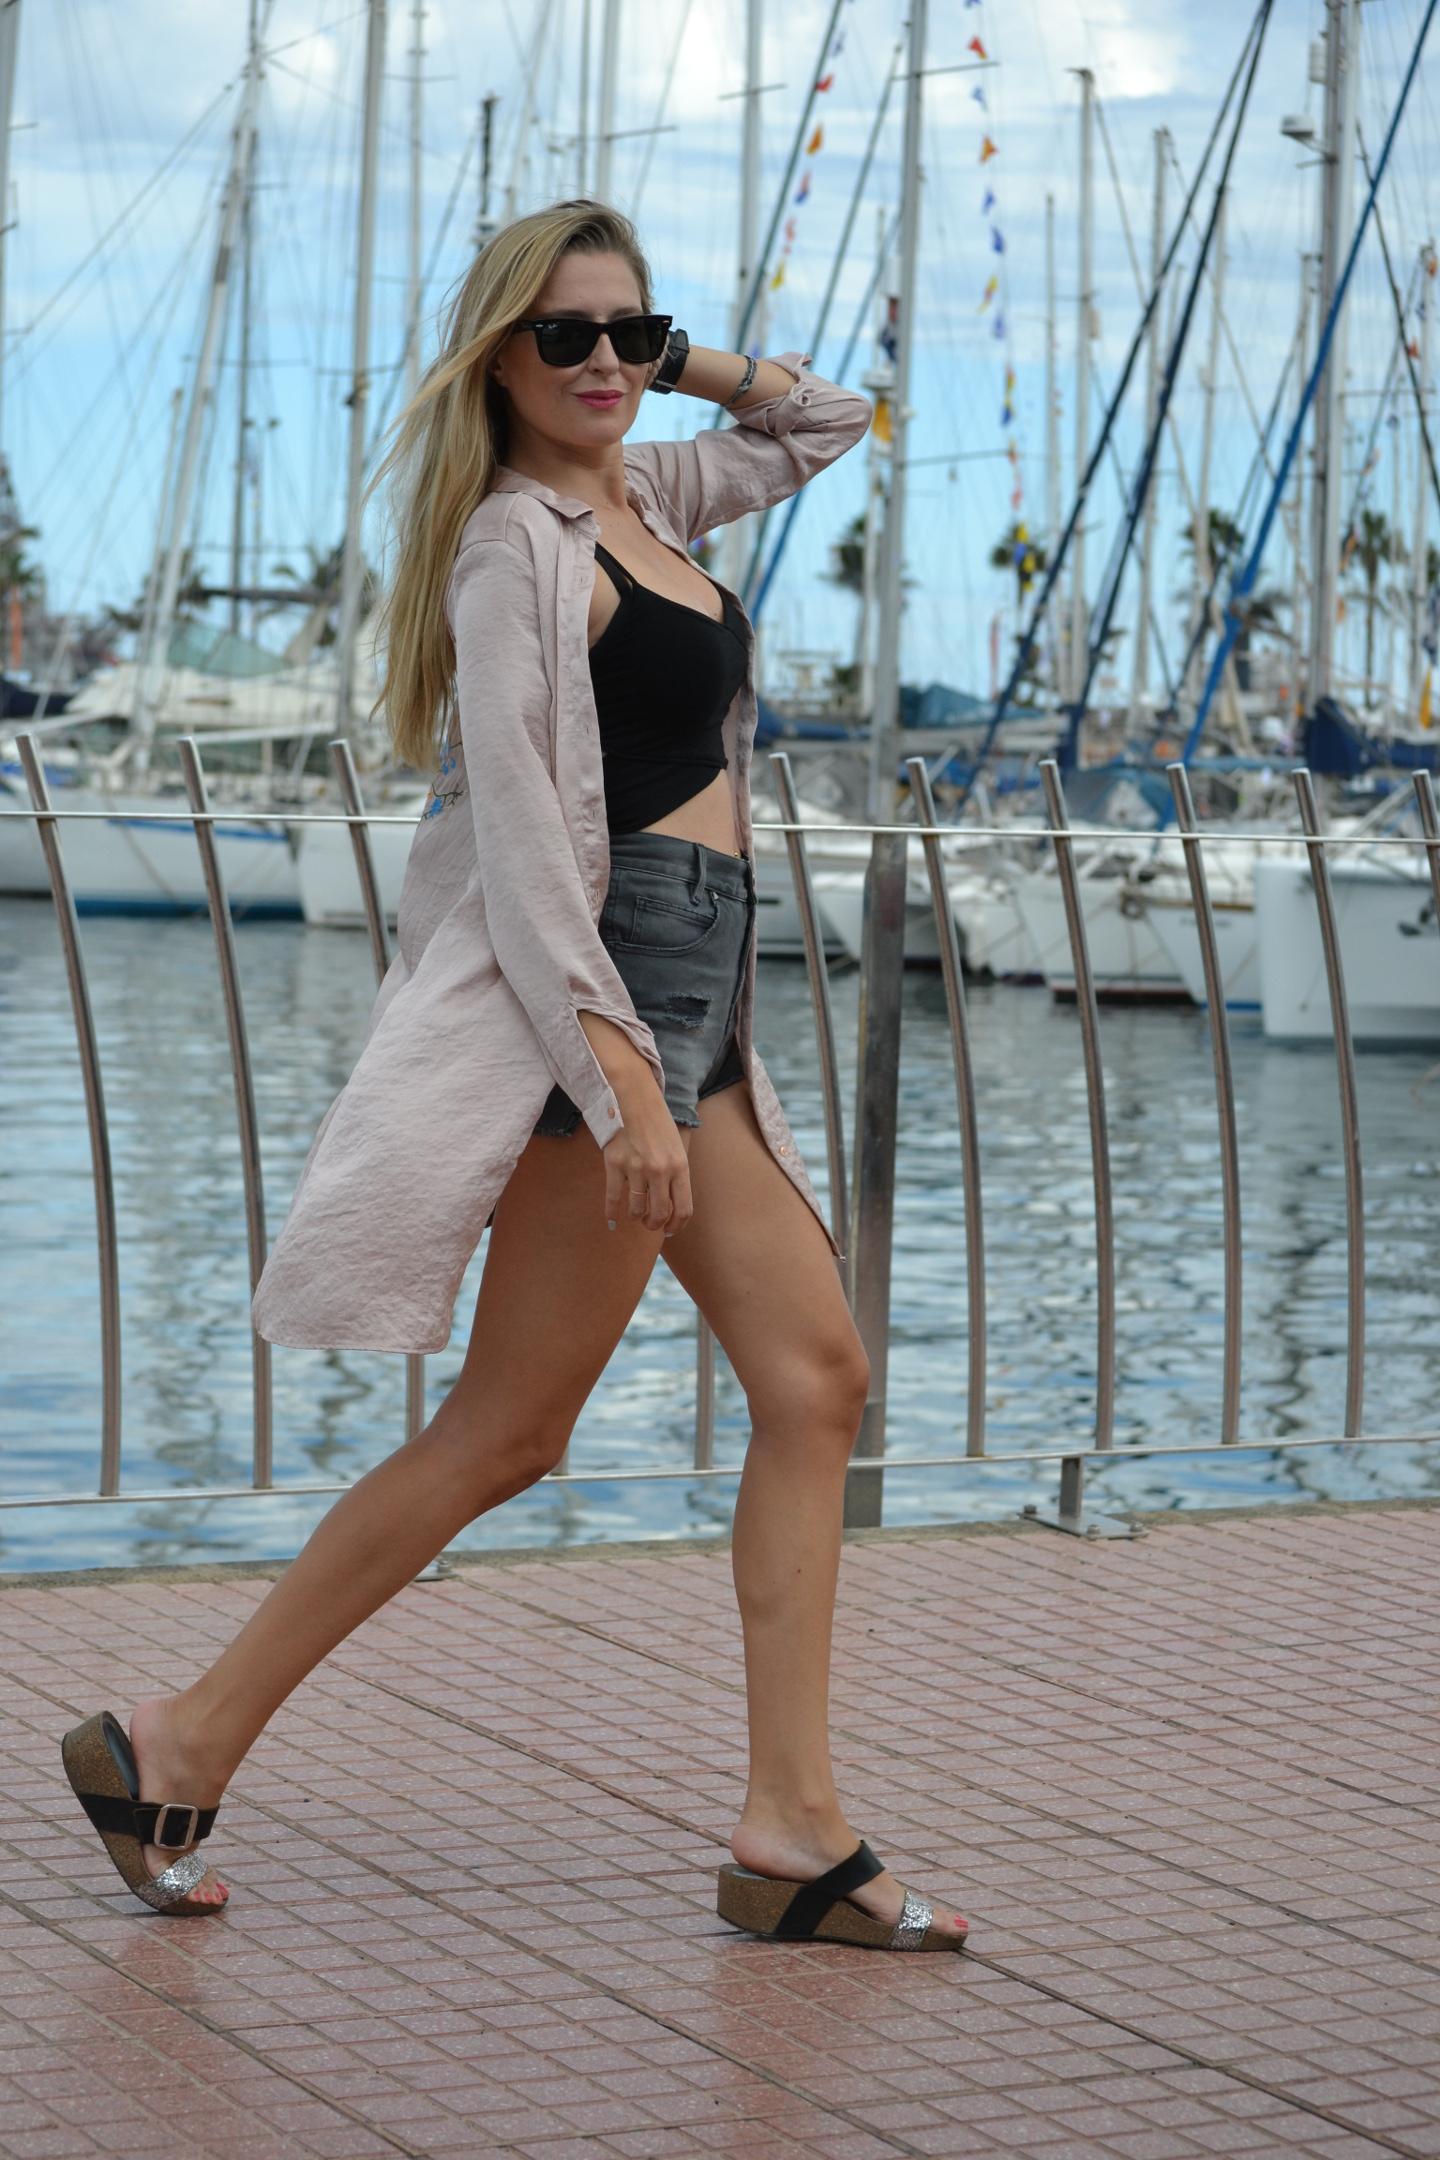 henry_london_puerto_deportivo_gran_canaria_lara_martin_gilarranz_bymyheels-22